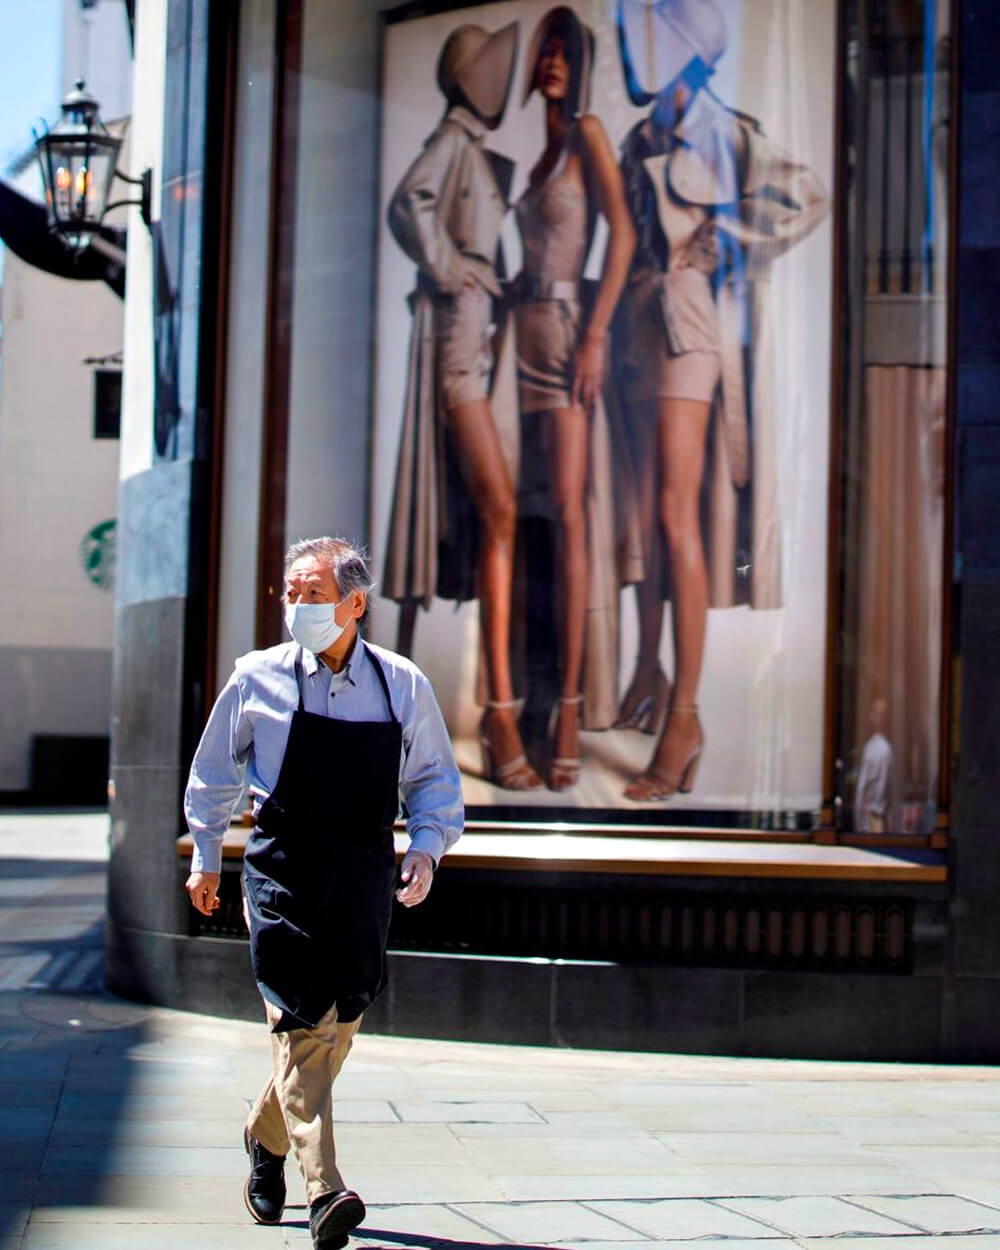 Covid 19 impact on fashion